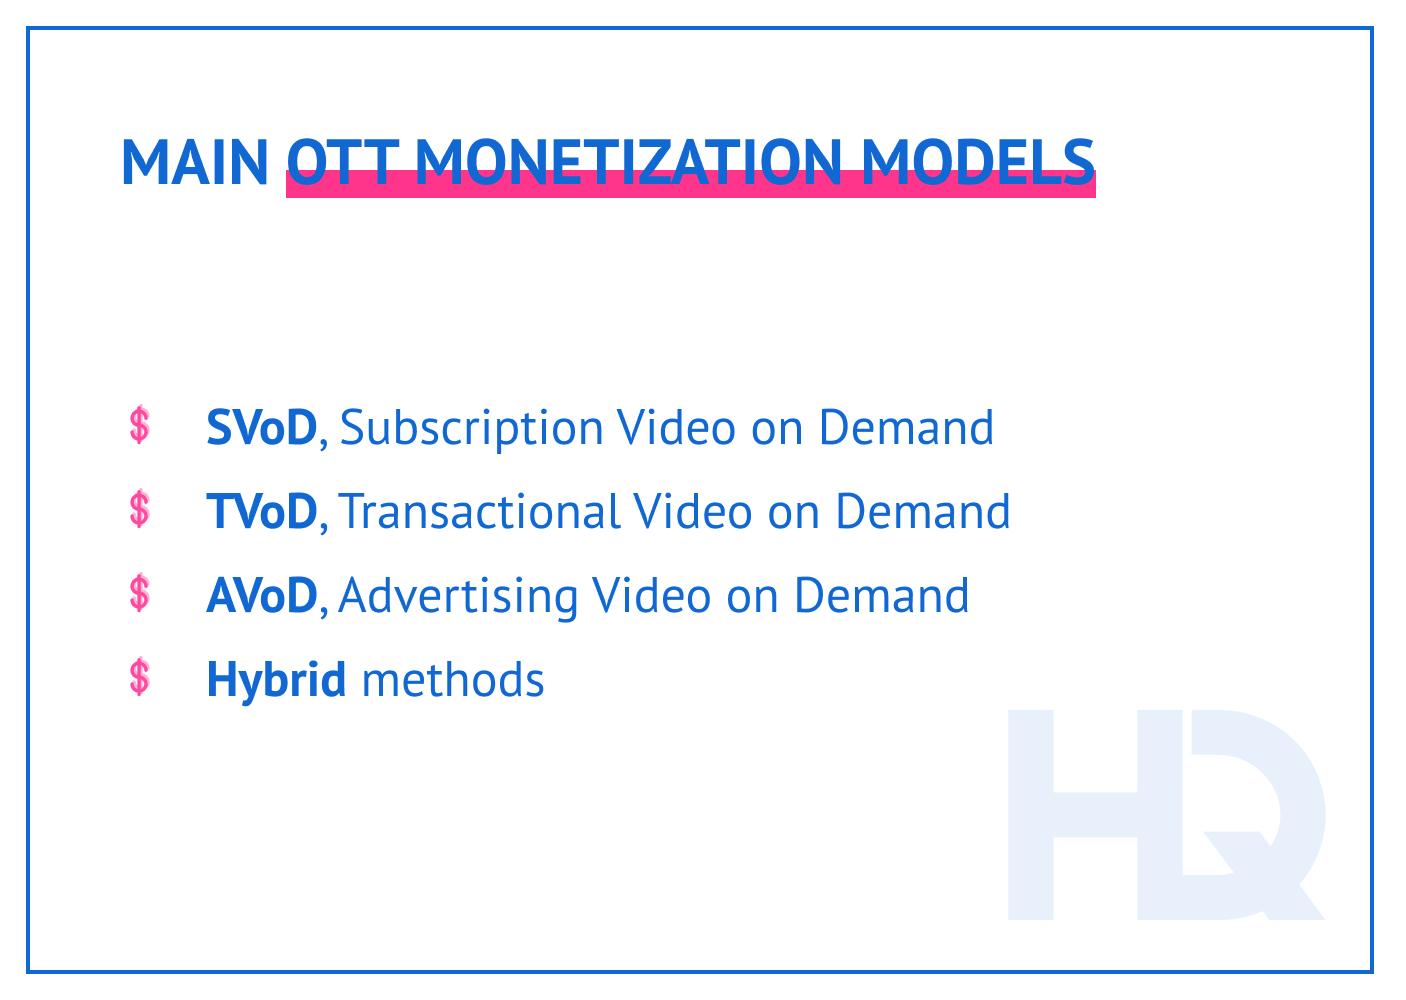 Main OTT monetization models.